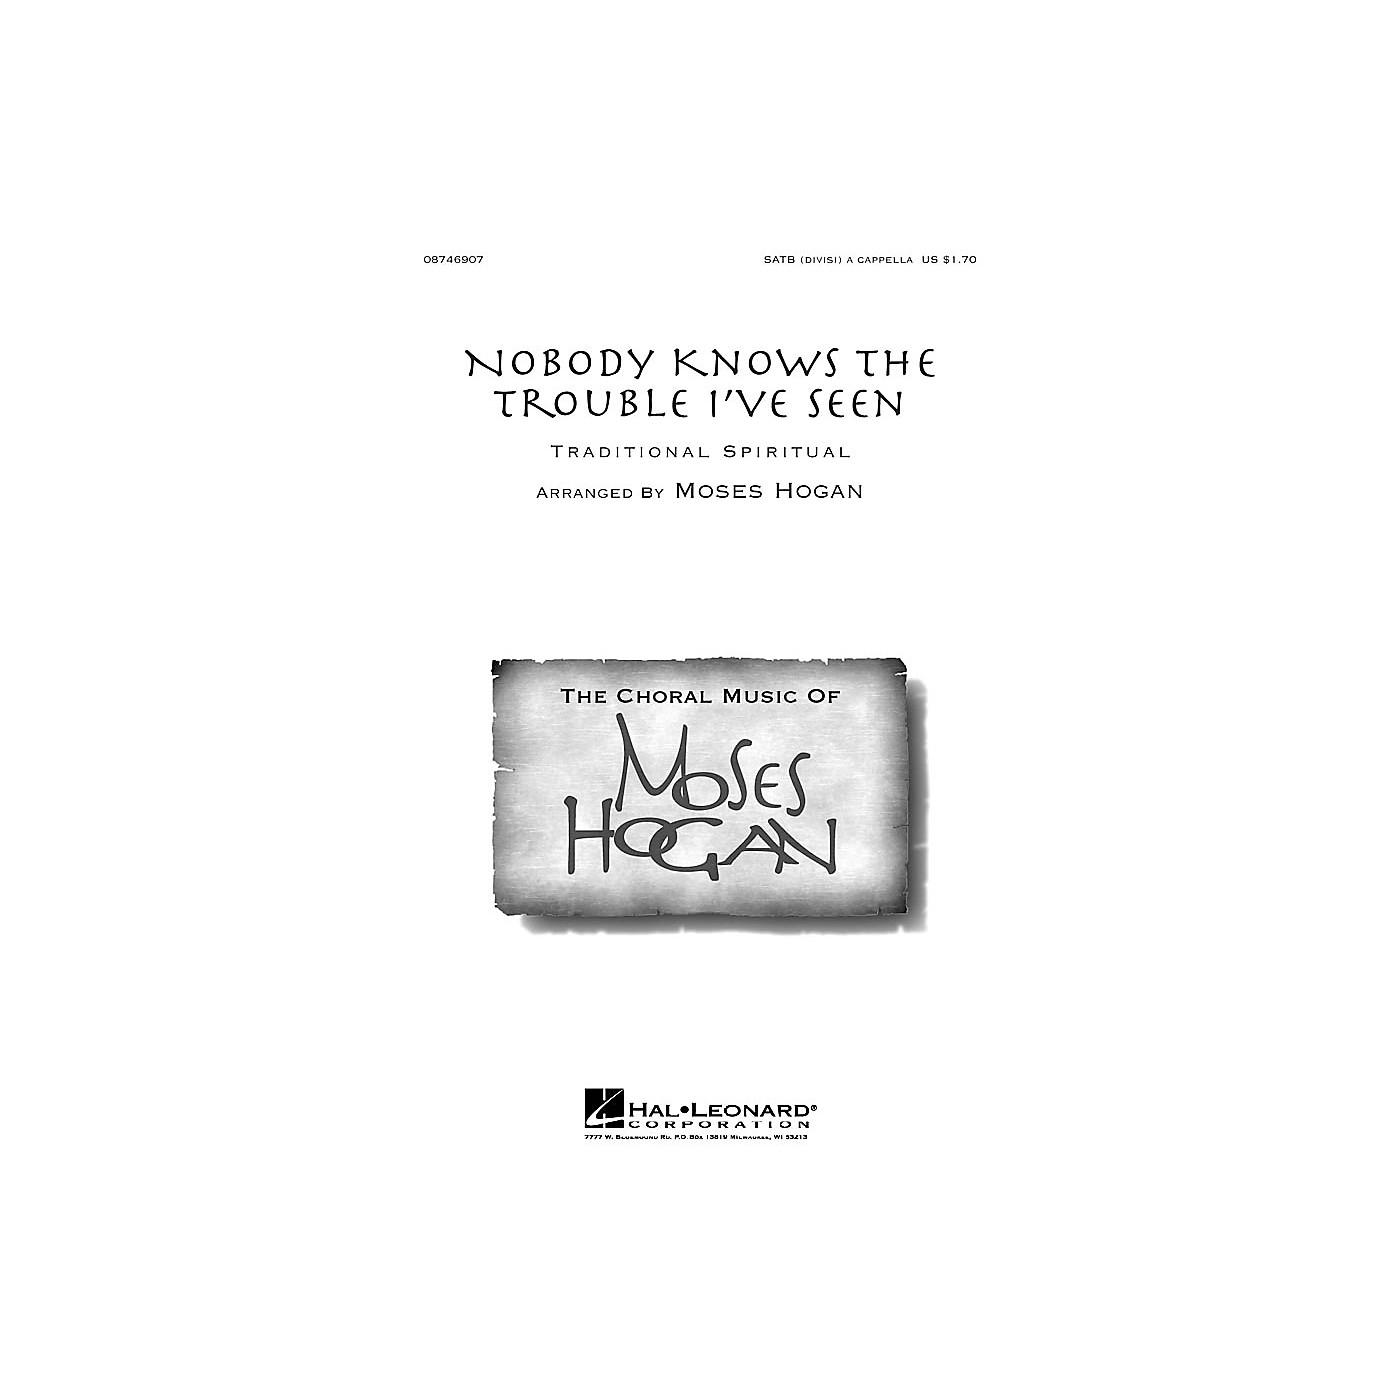 Hal Leonard Nobody Knows the Trouble I've Seen SATB DV A Cappella arranged by Moses Hogan thumbnail